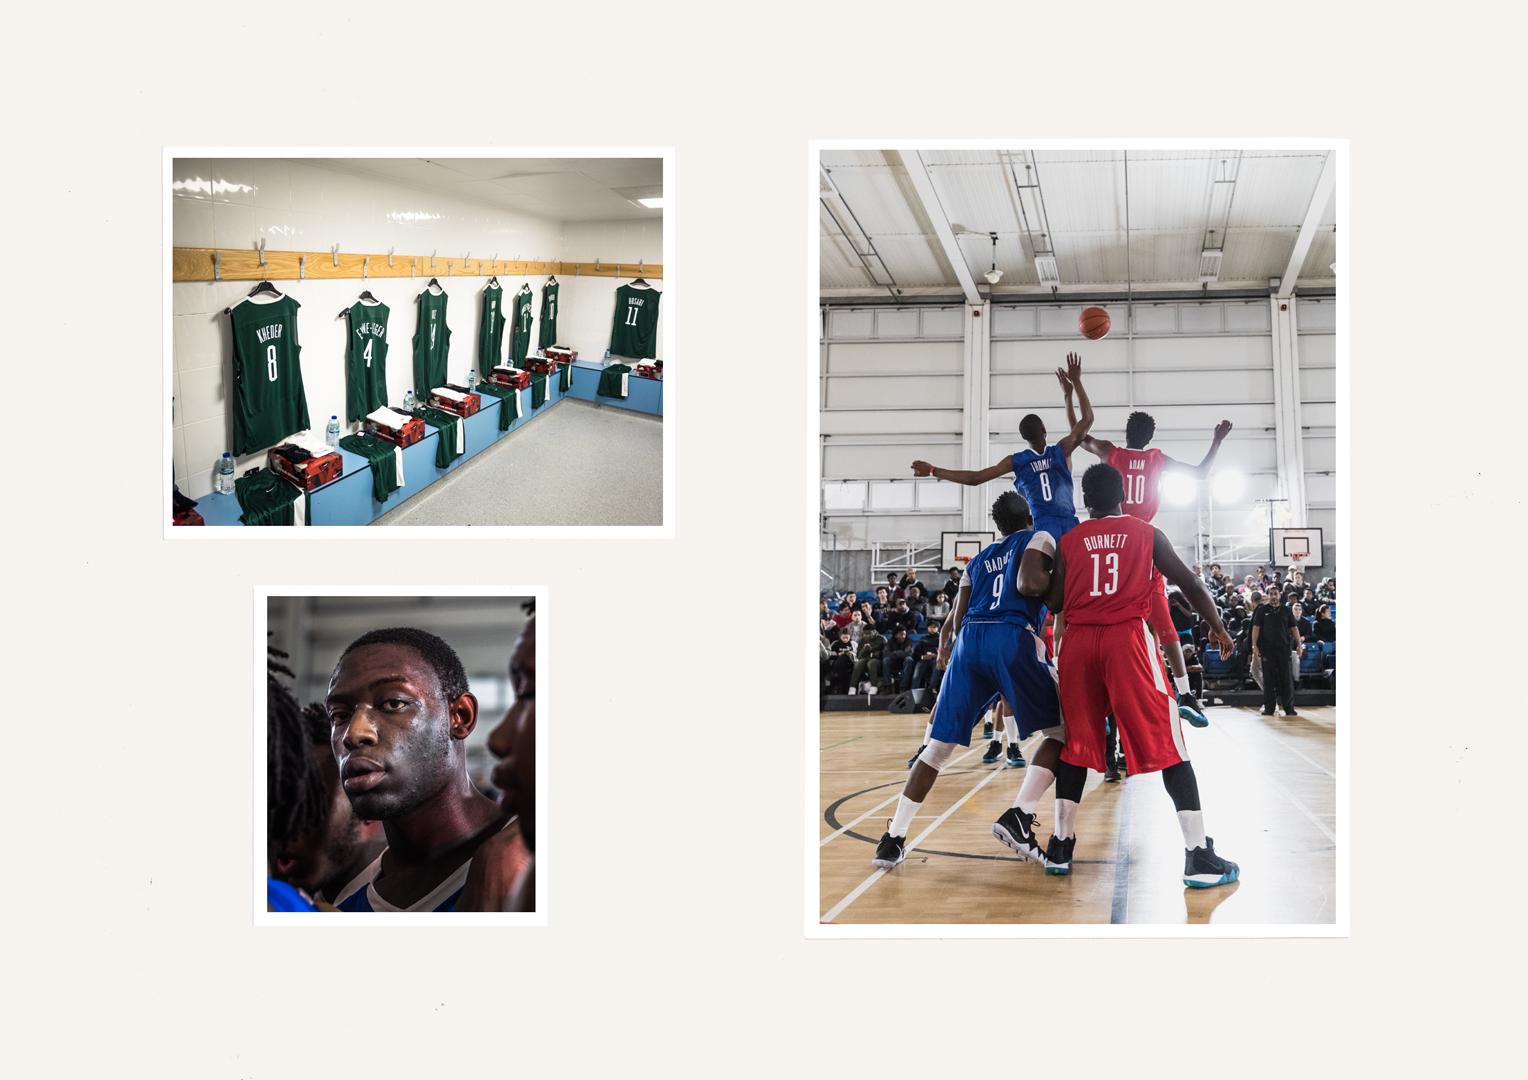 Nike_Basketball_Gallery_Image_1.jpg